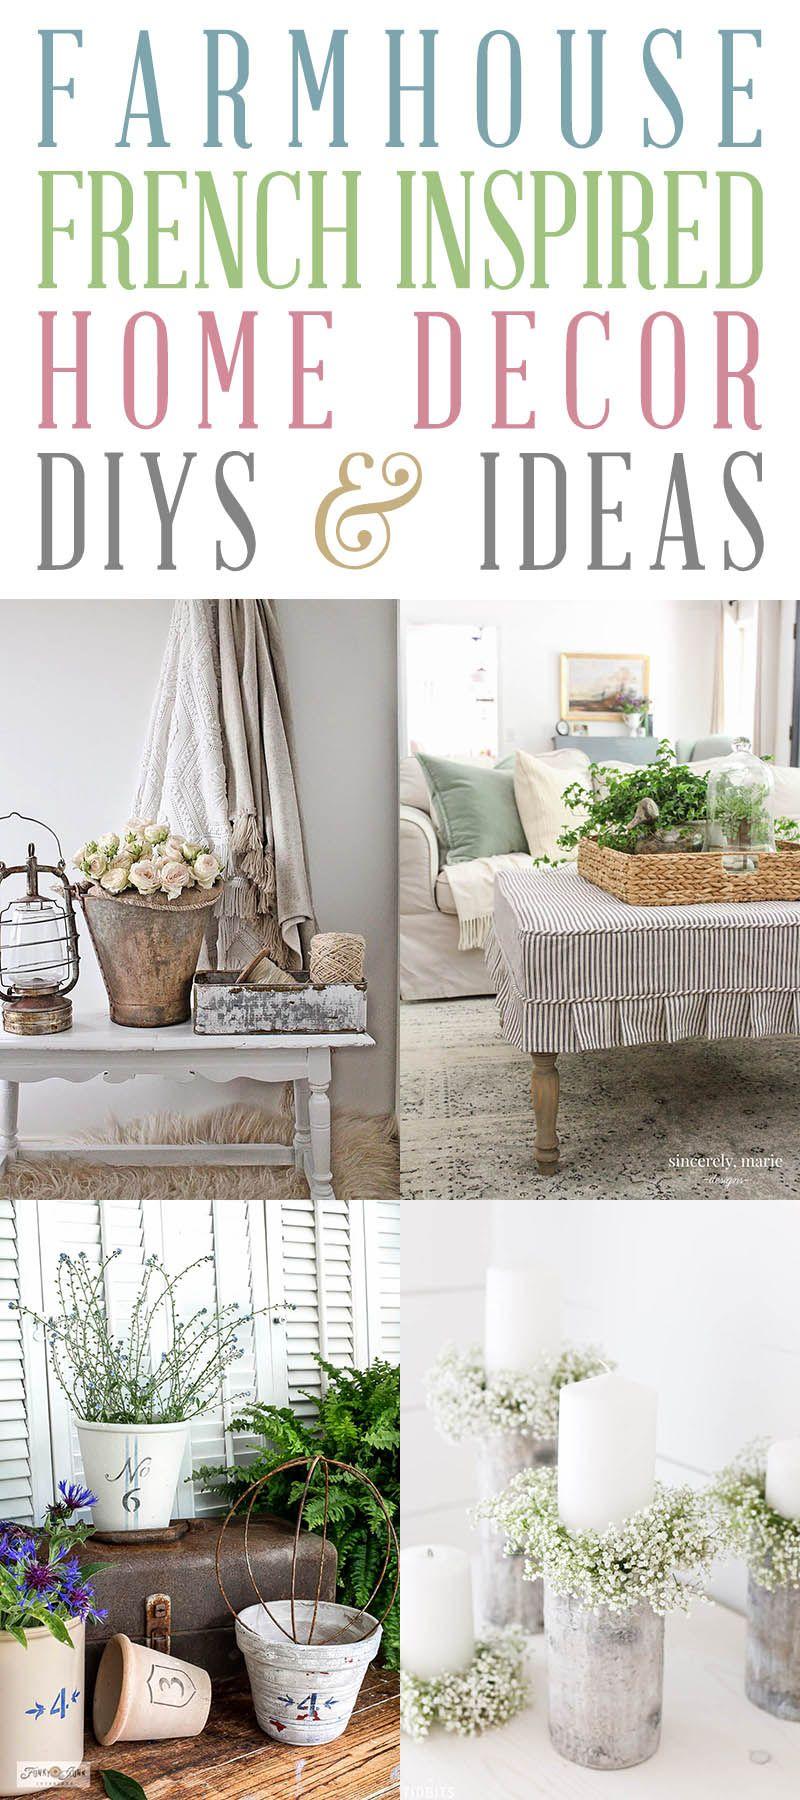 Farmhouse French Inspired Home Decor Ideas and DIYS - The ...